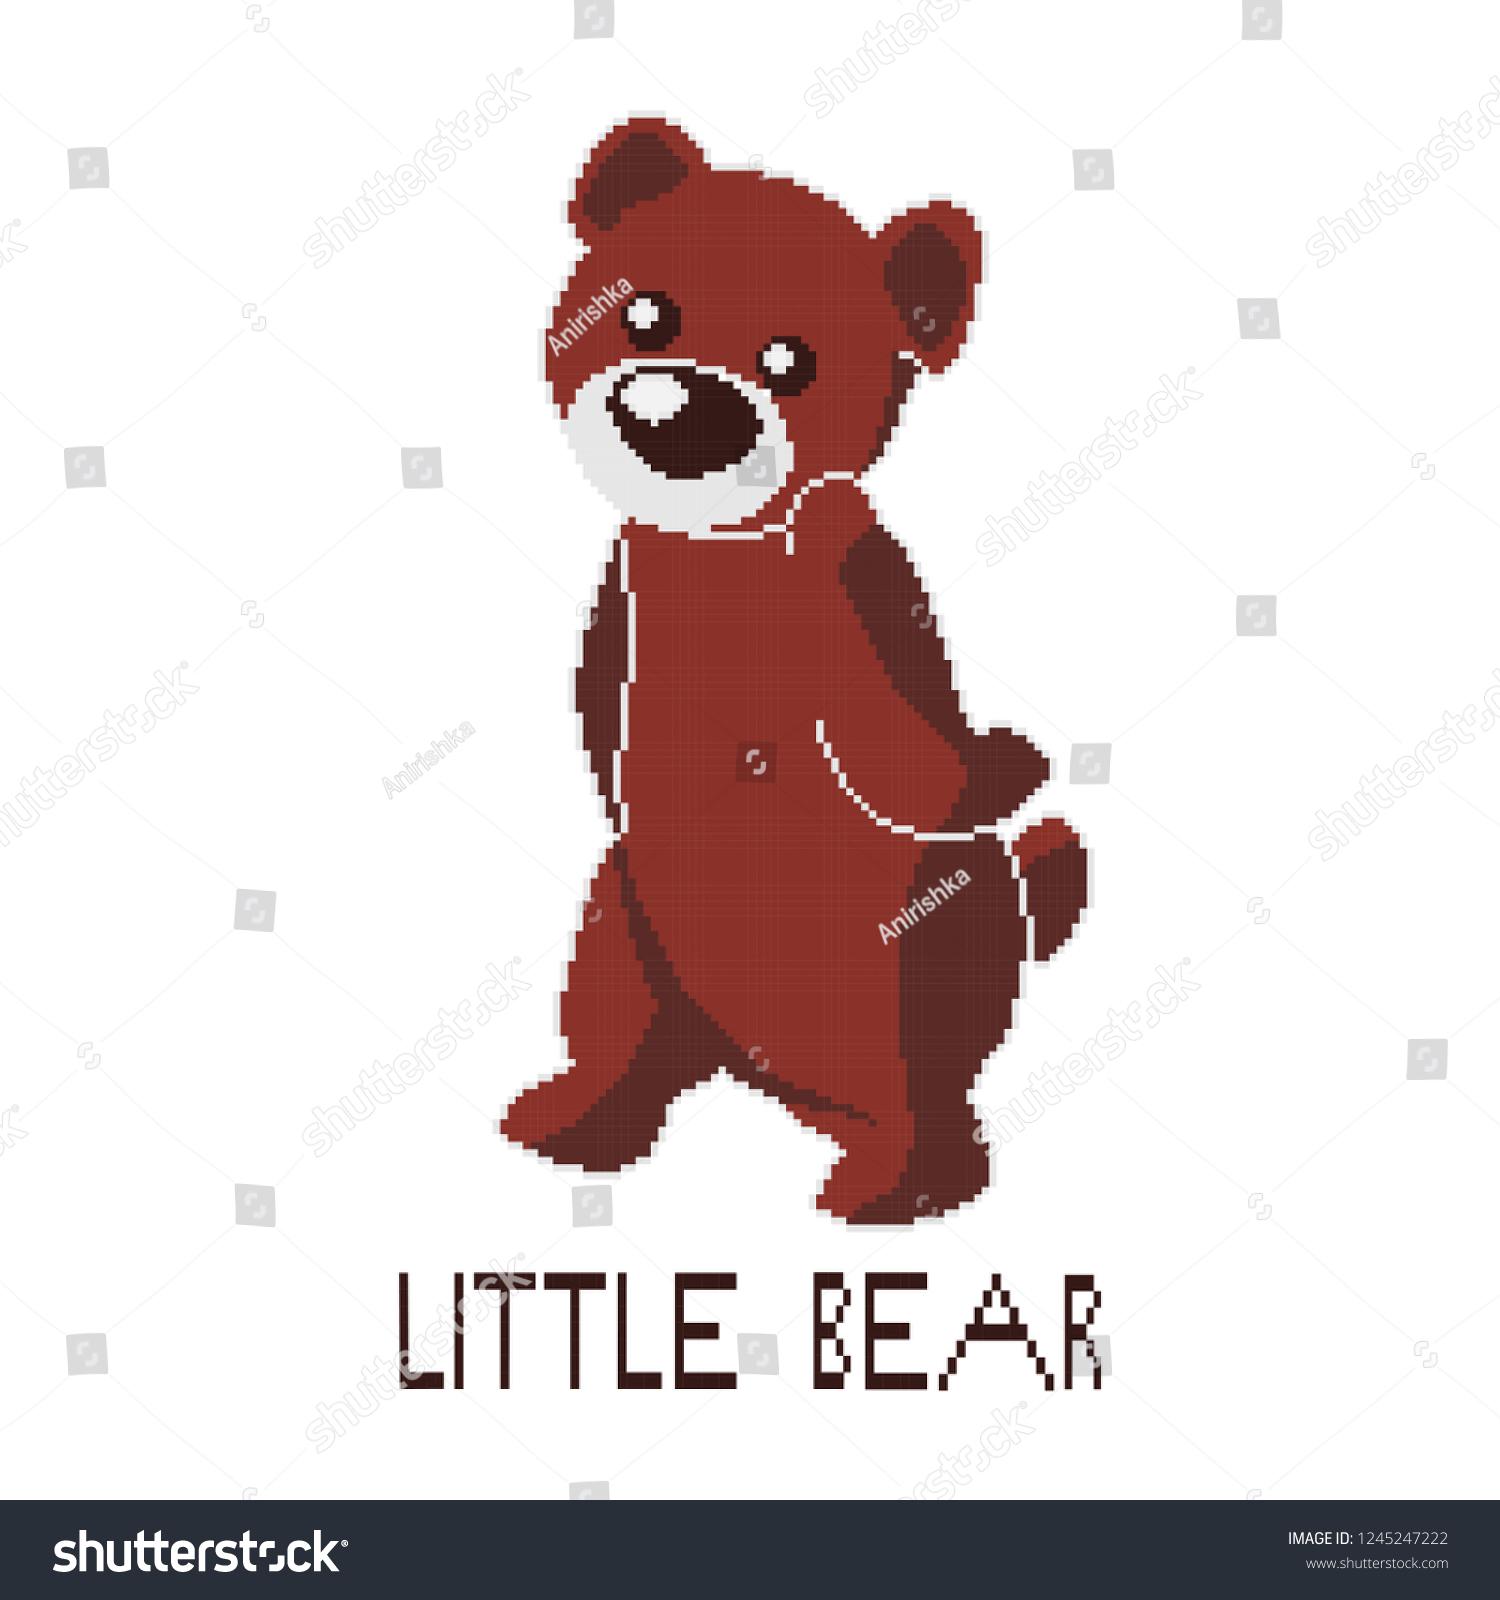 hight resolution of cute teddy bear clipart pixel art illustration of a brown bear